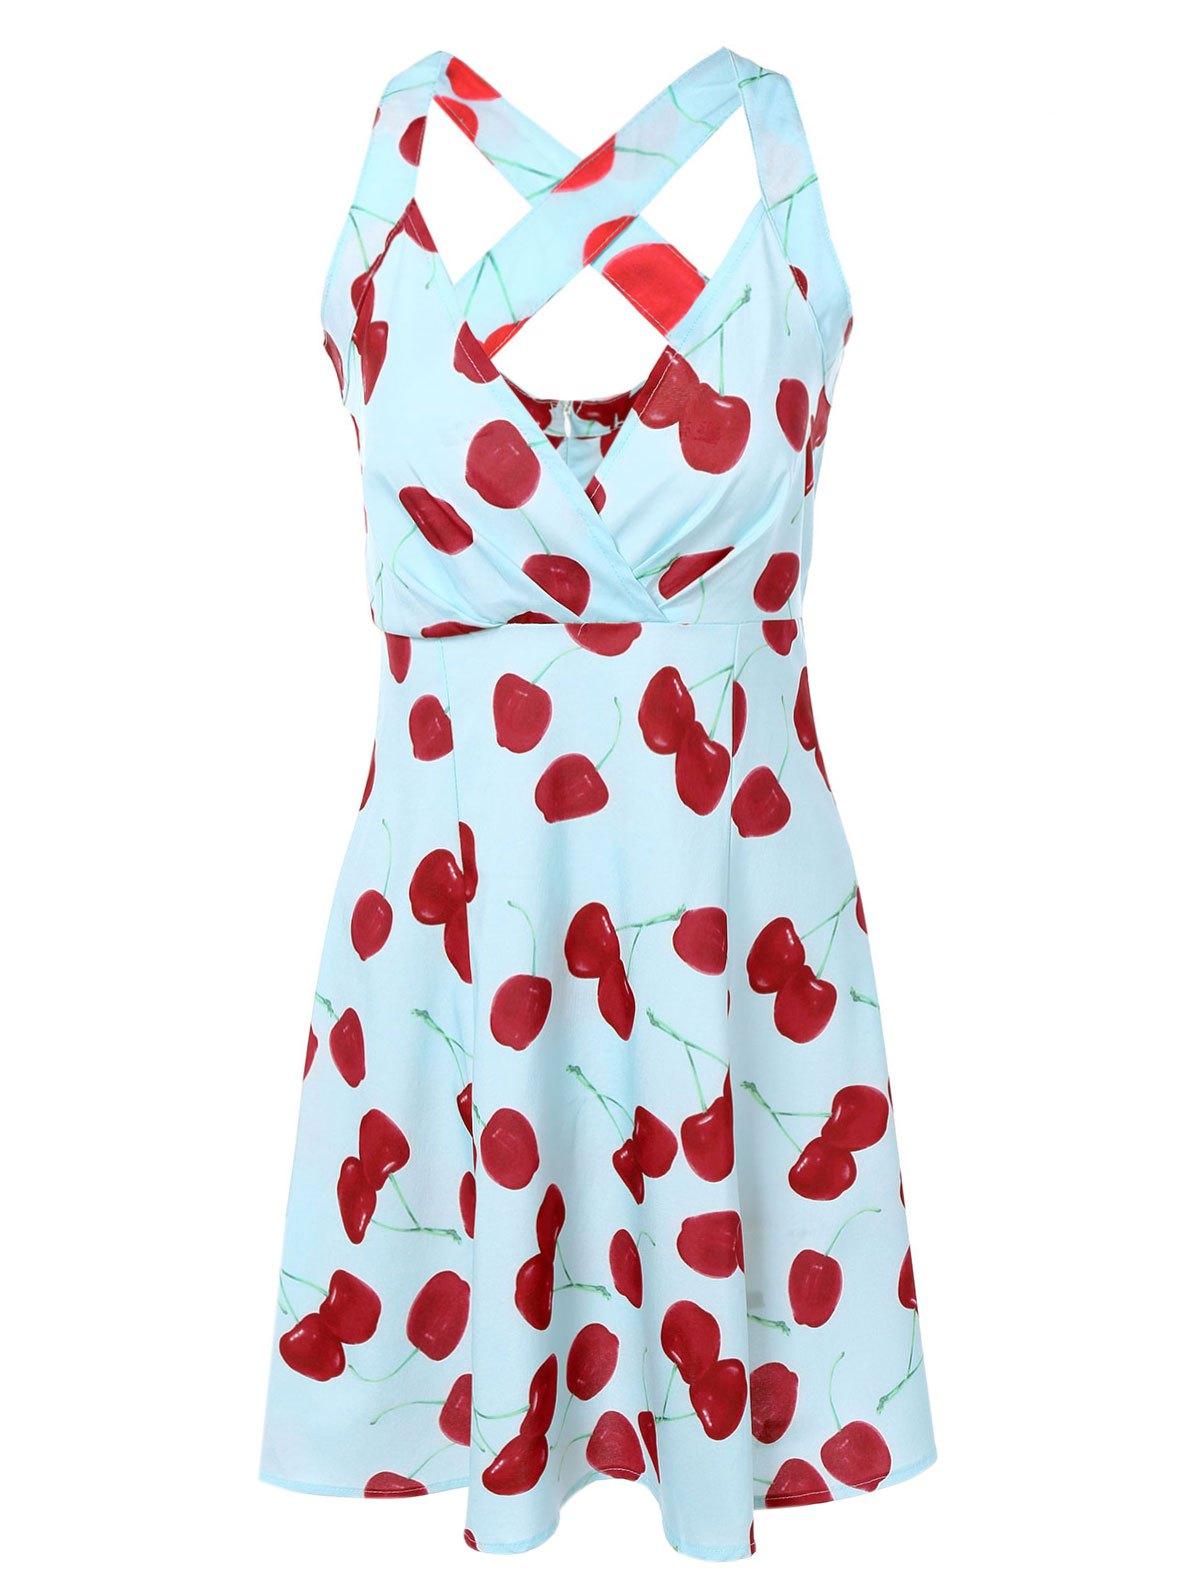 Criss Back Cherry Print Dress